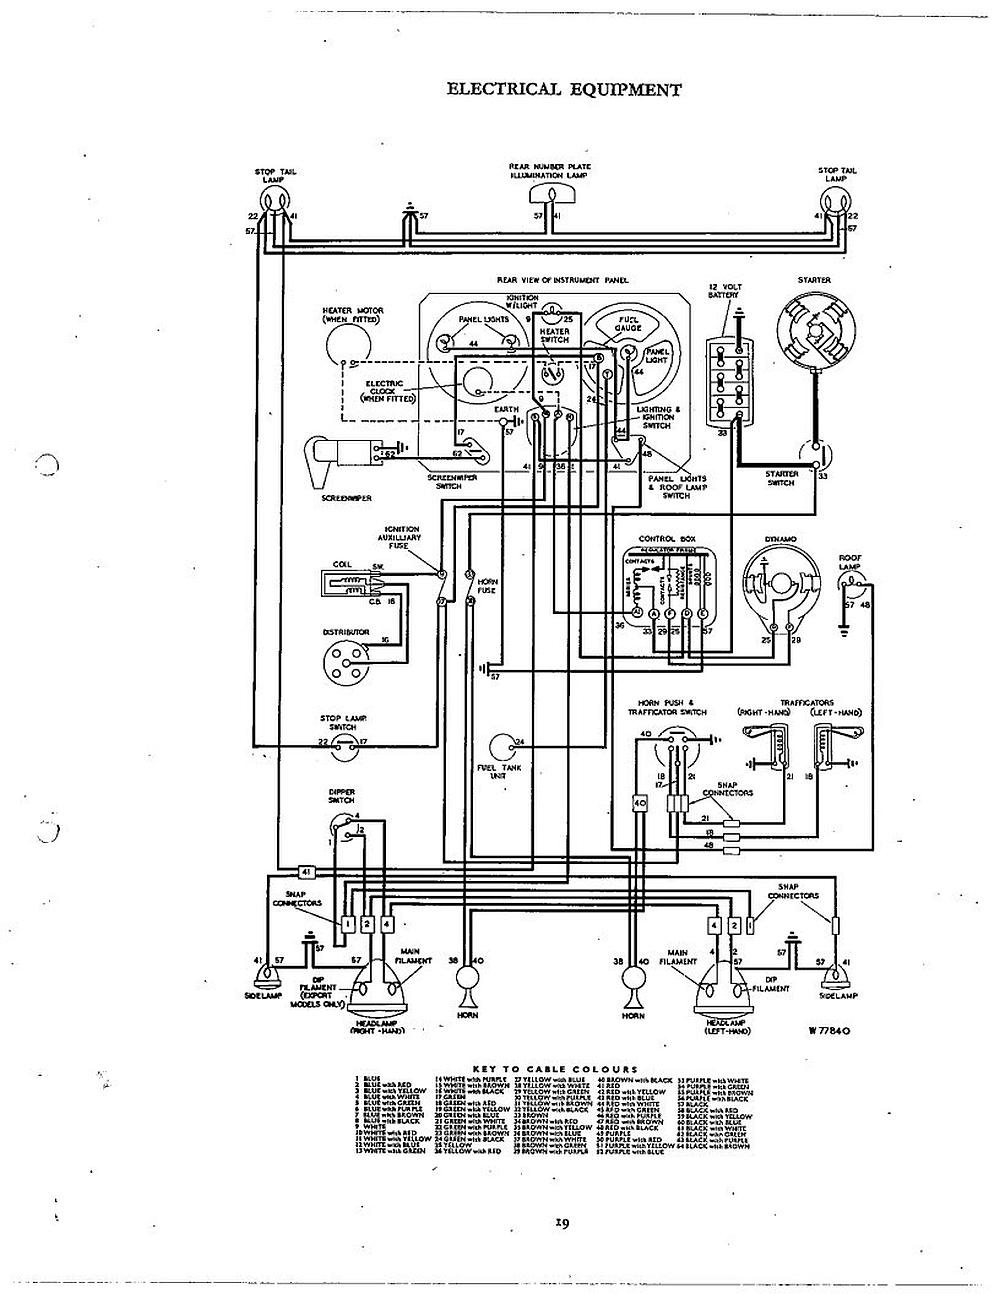 Wiring Diagram Triumph Tr25w Trusted Diagrams Bonneville Headlight Circuit And Hub U2022 1969